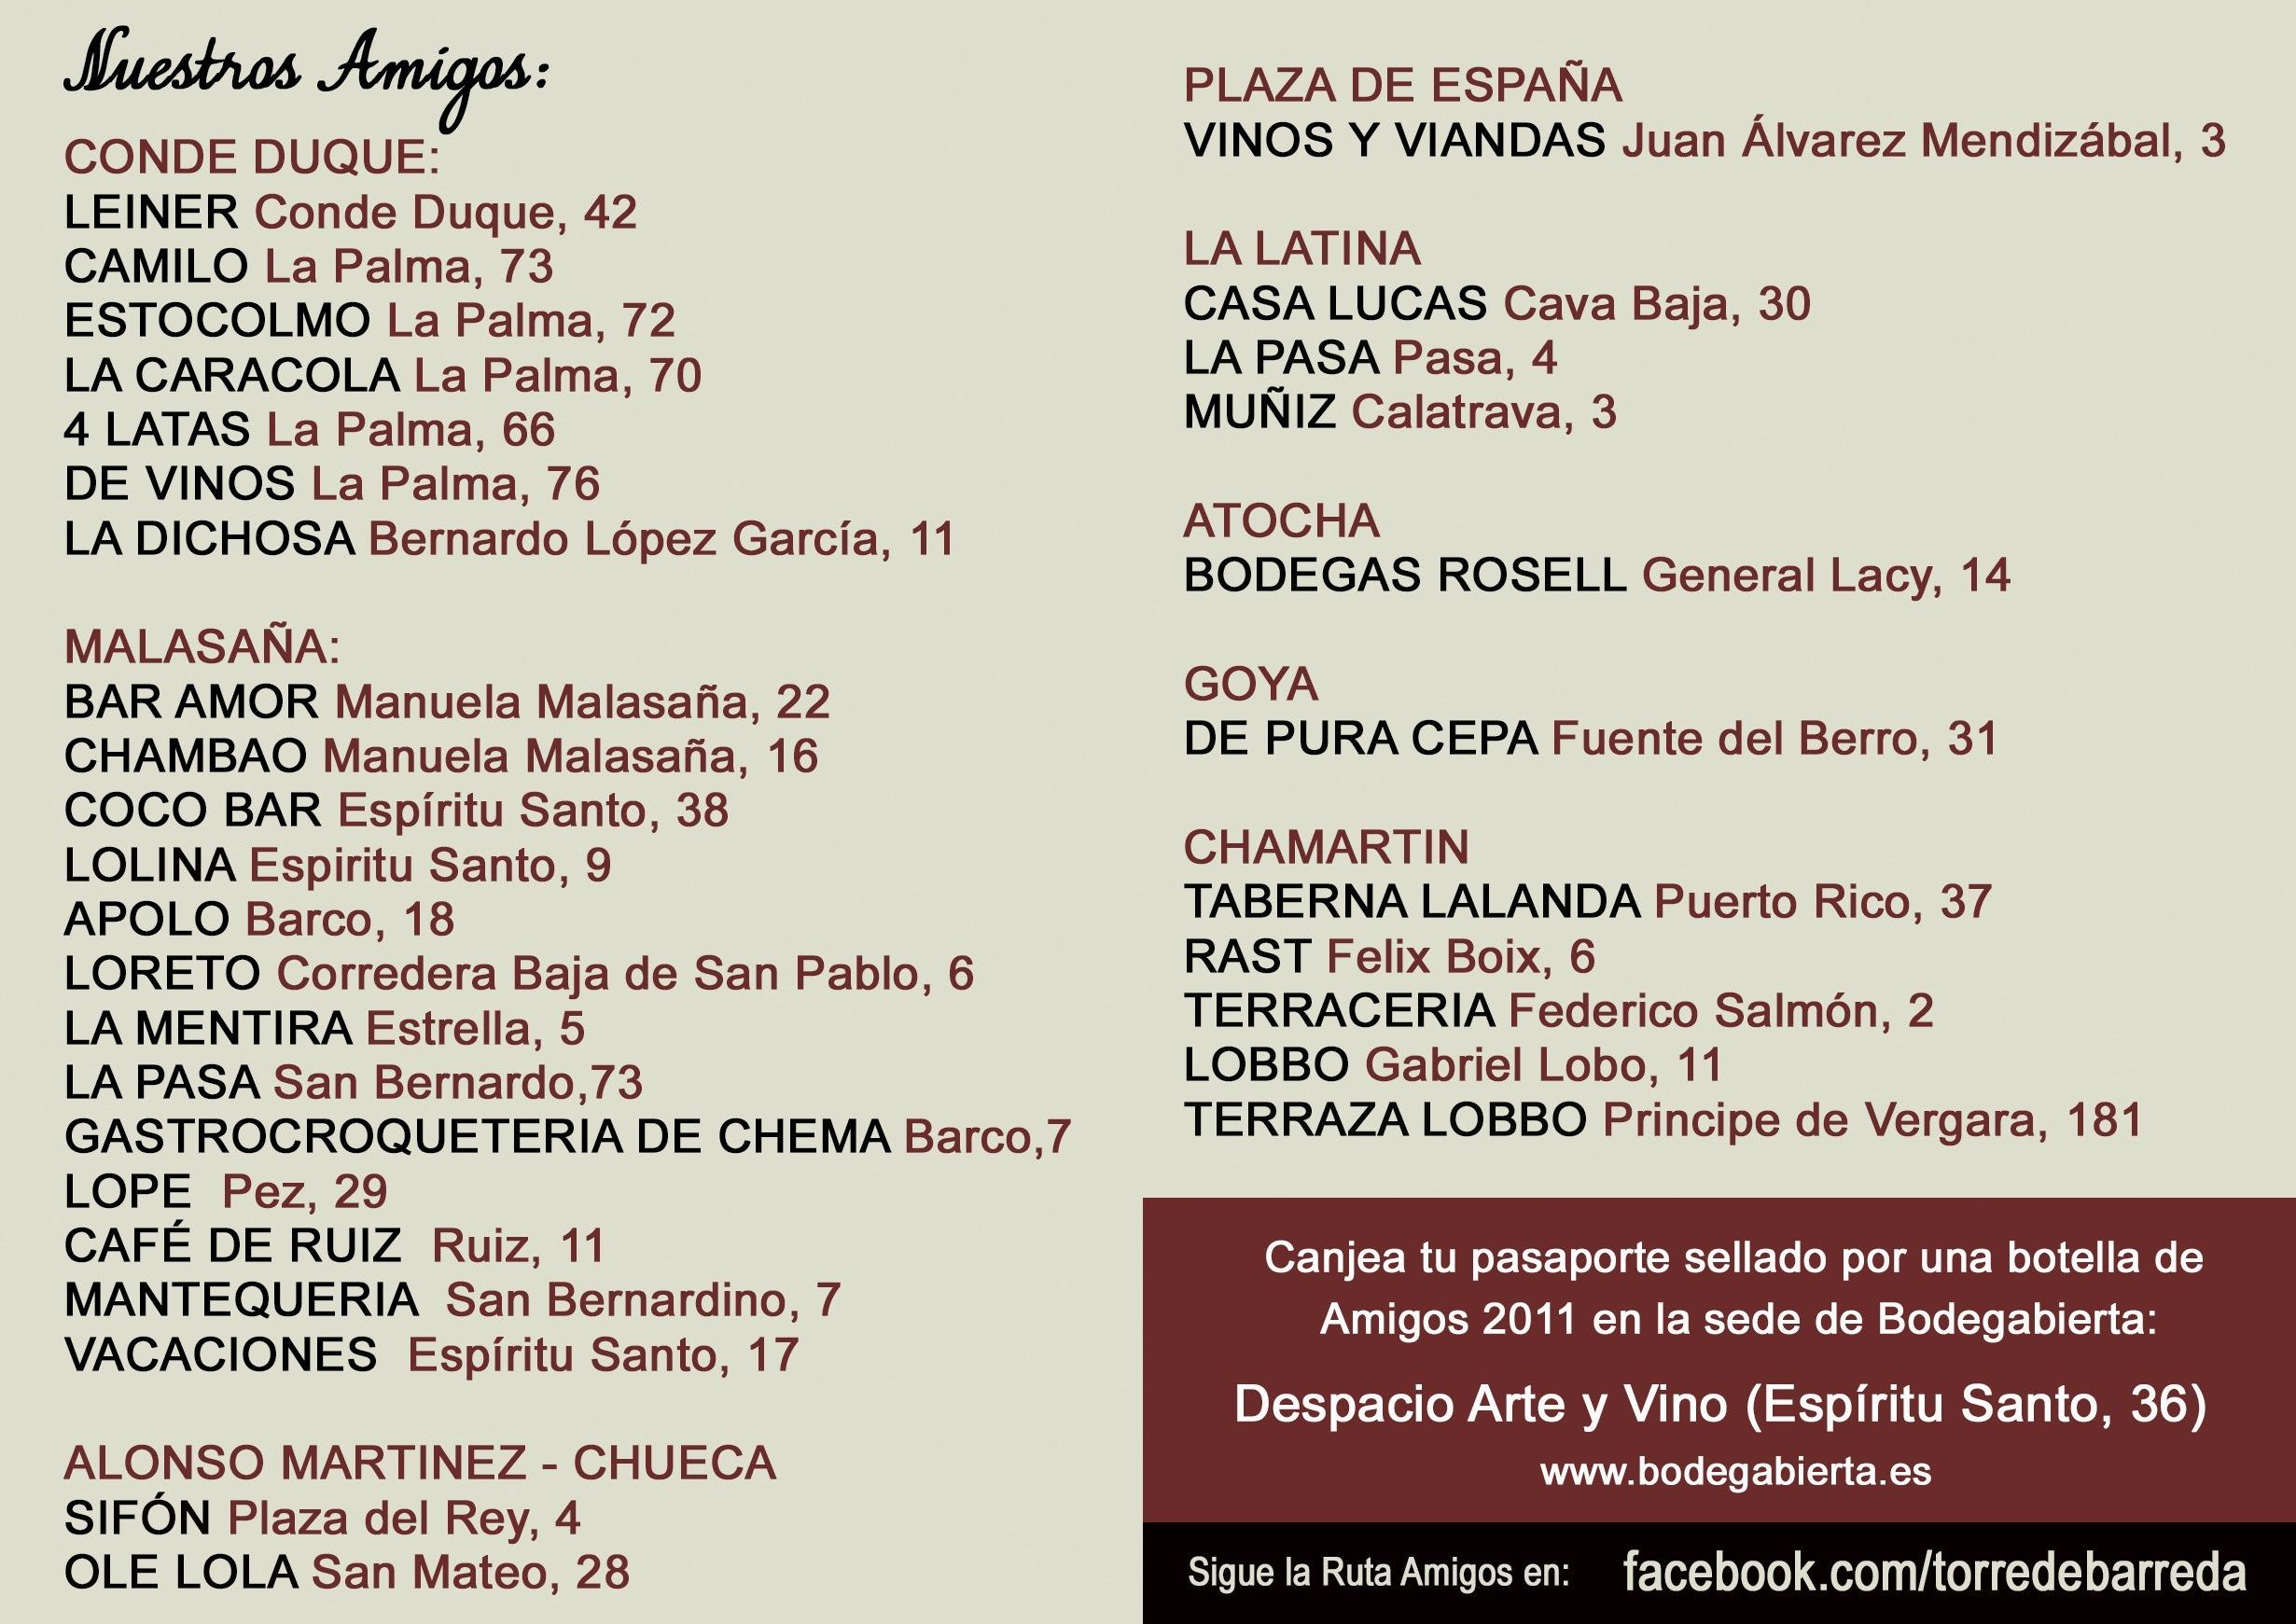 Pasaporte_Amigos_B